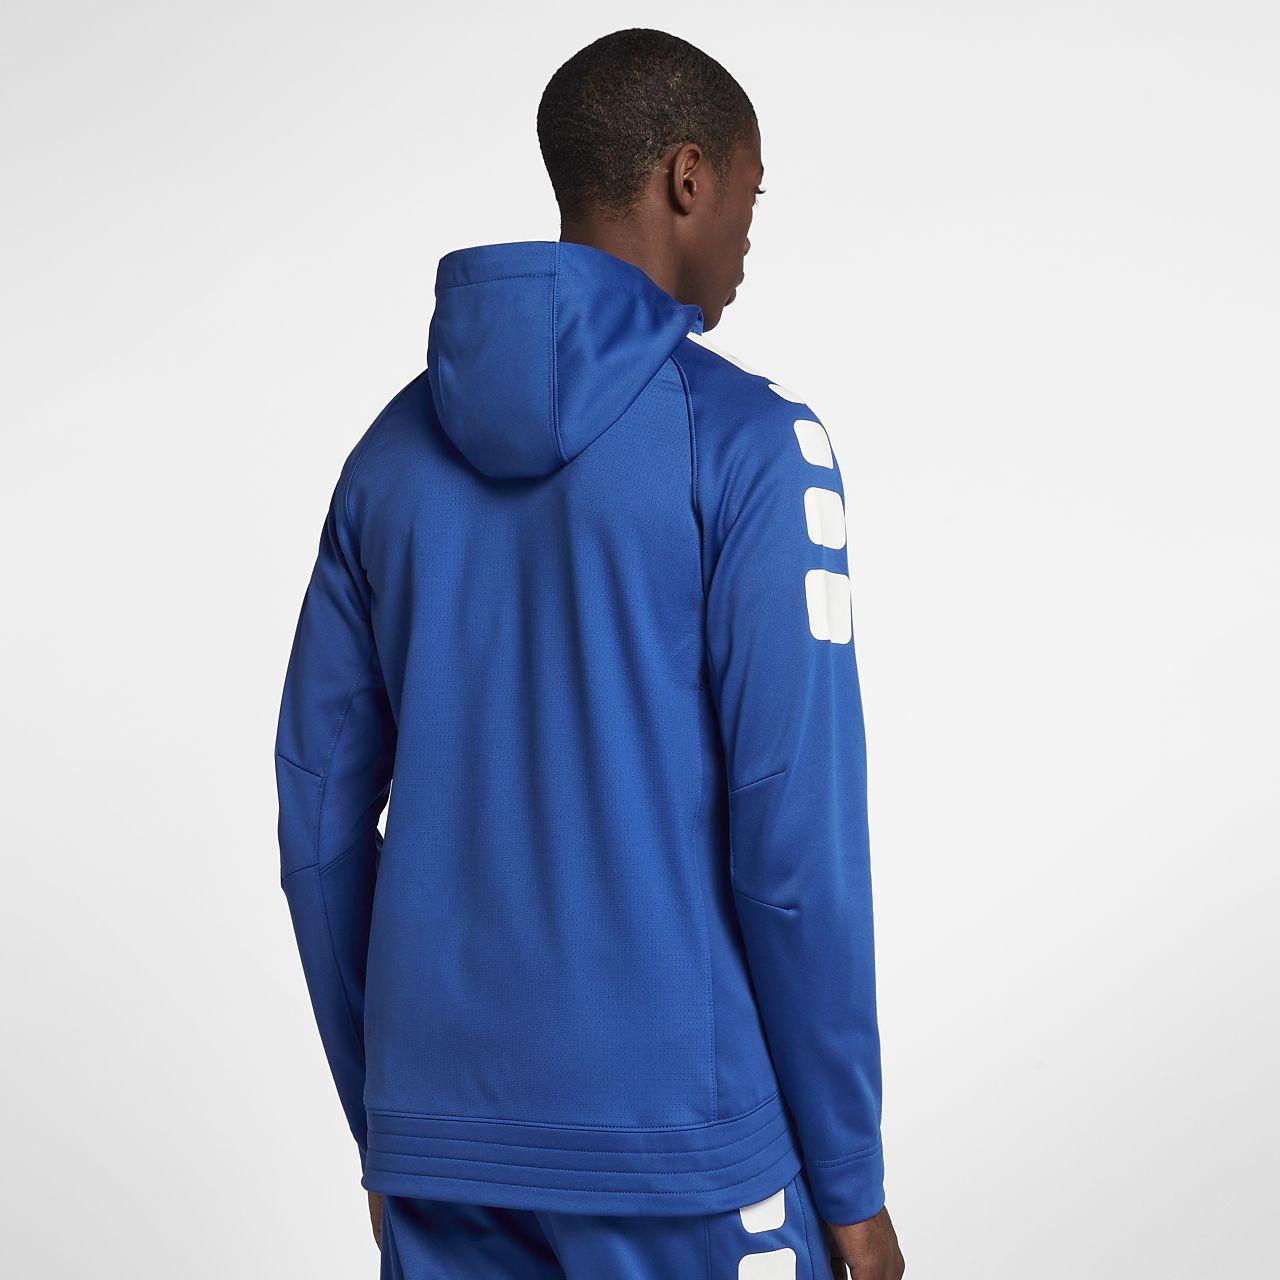 f533ddbd59e2d1 Nike Therma Elite Men s Basketball Hoodie. Nike.com